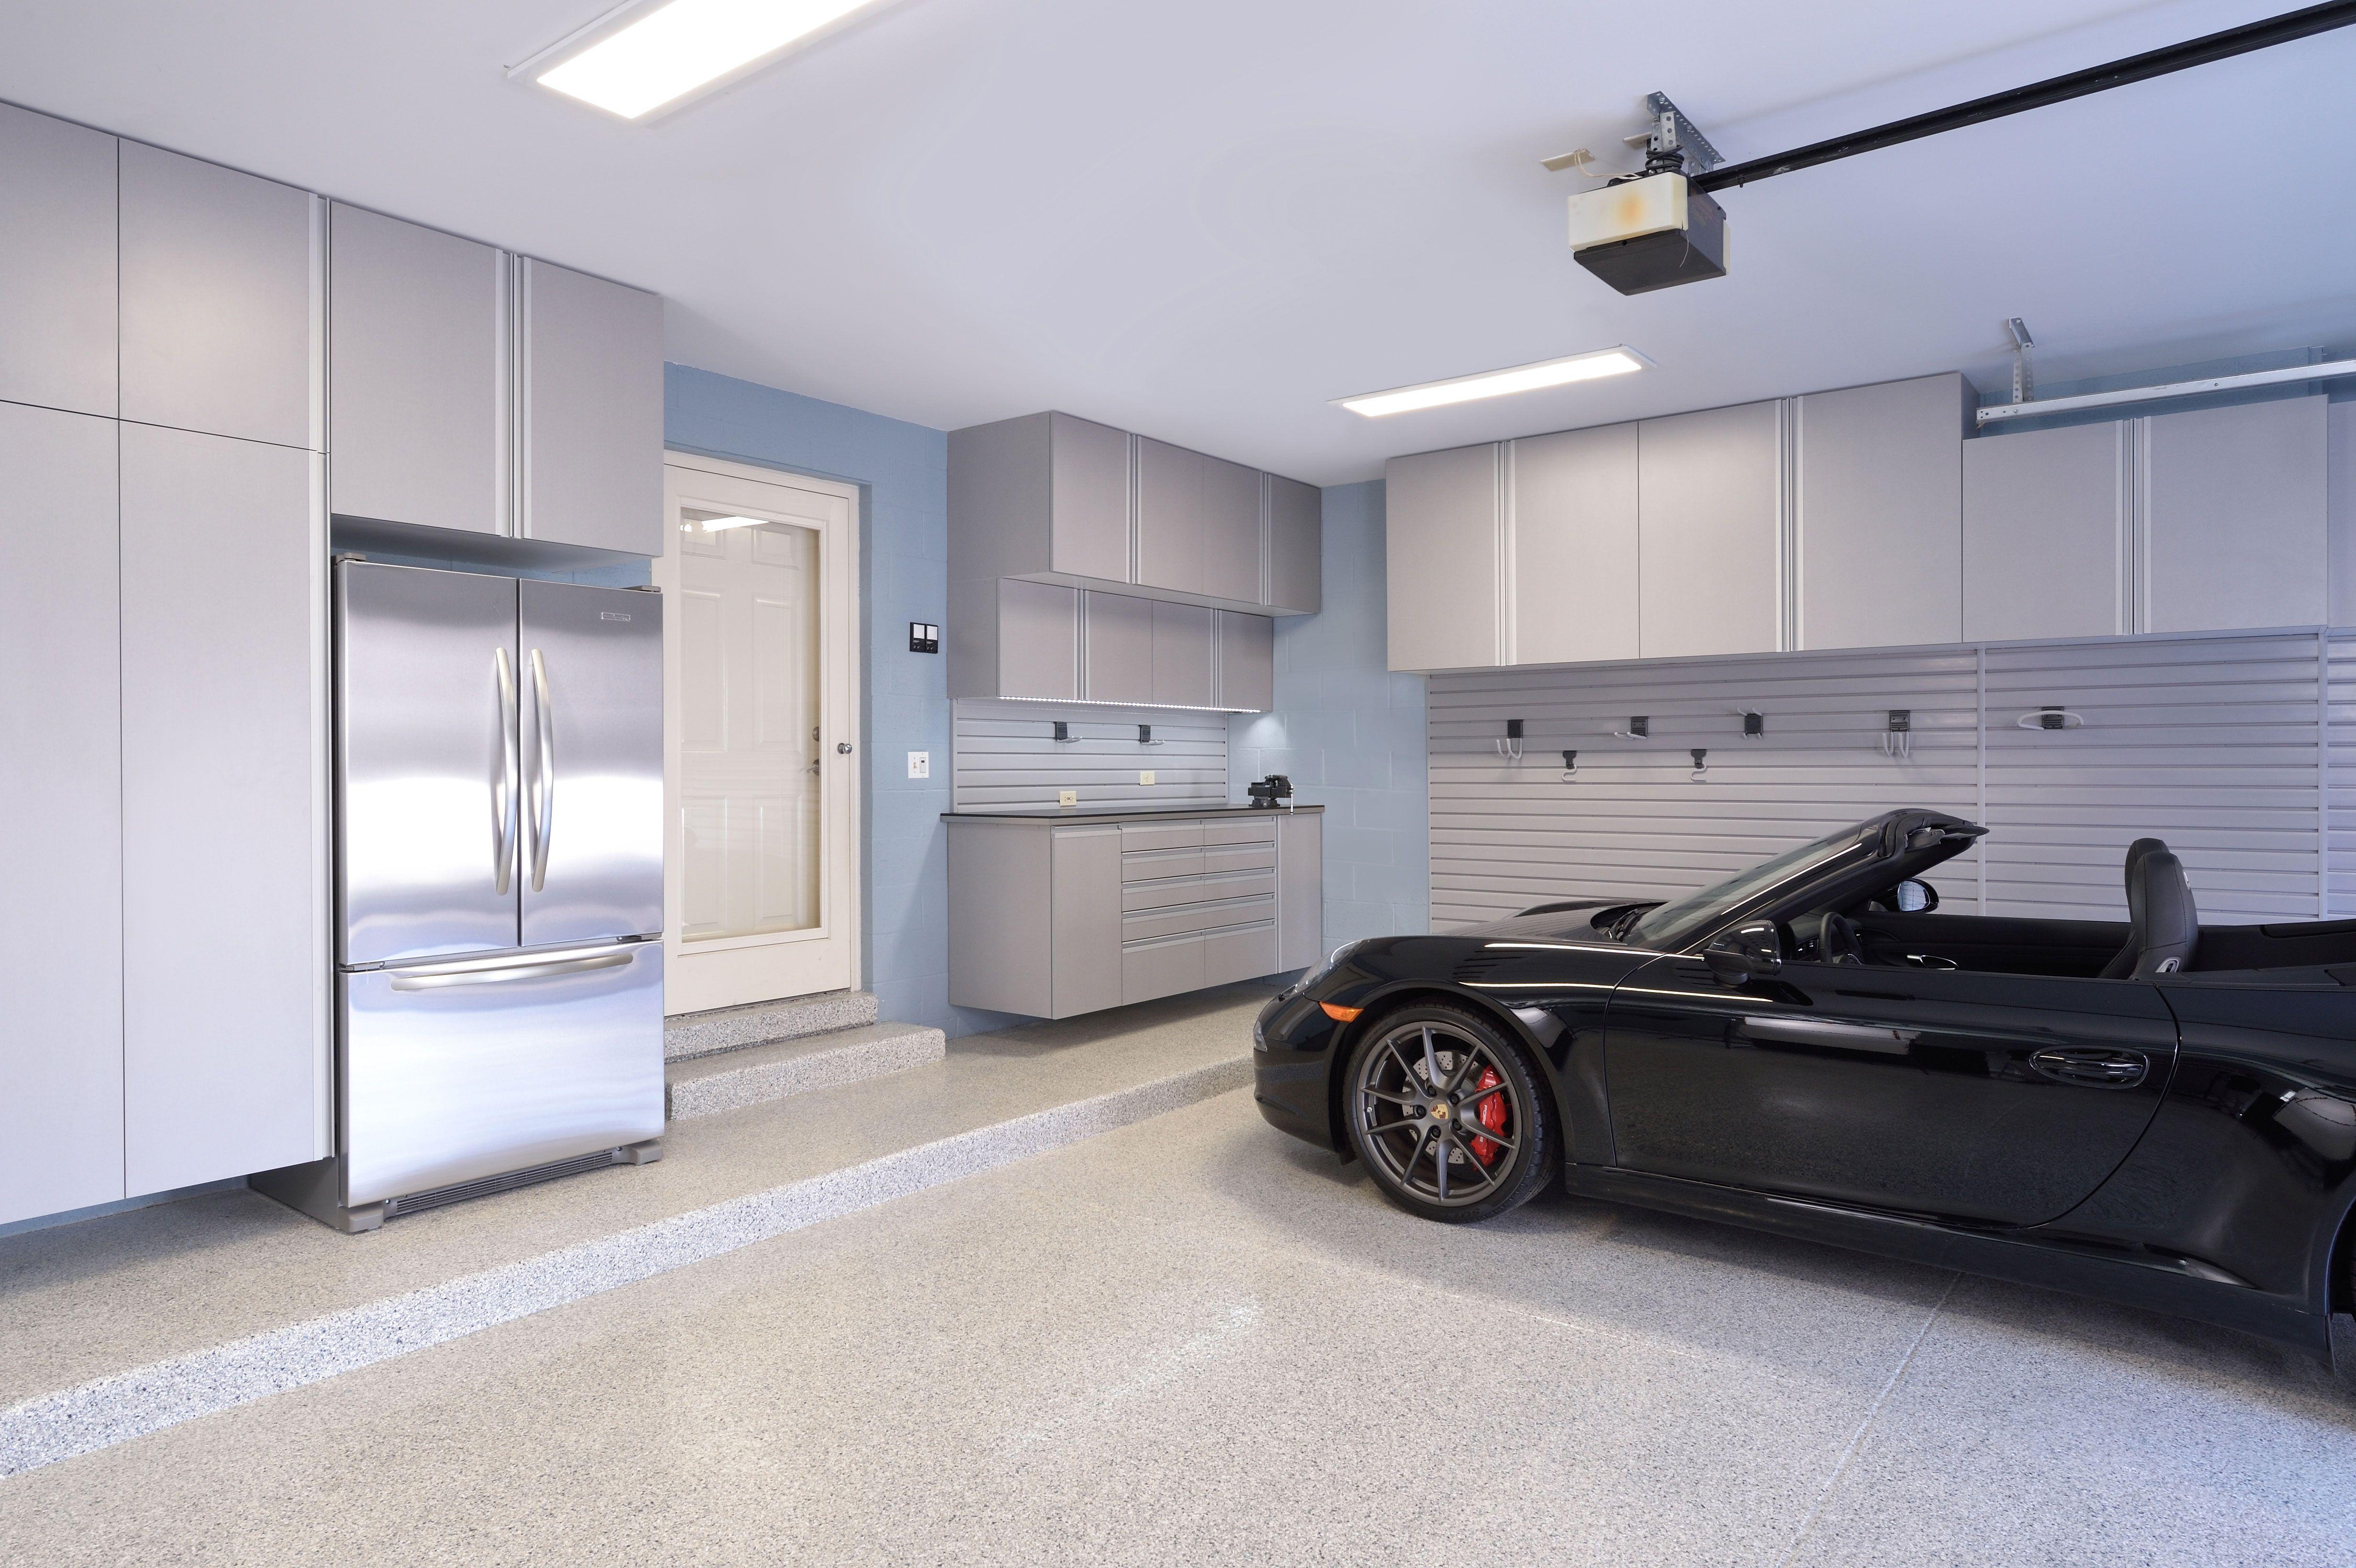 Garage renovation company enjoys sweet second act